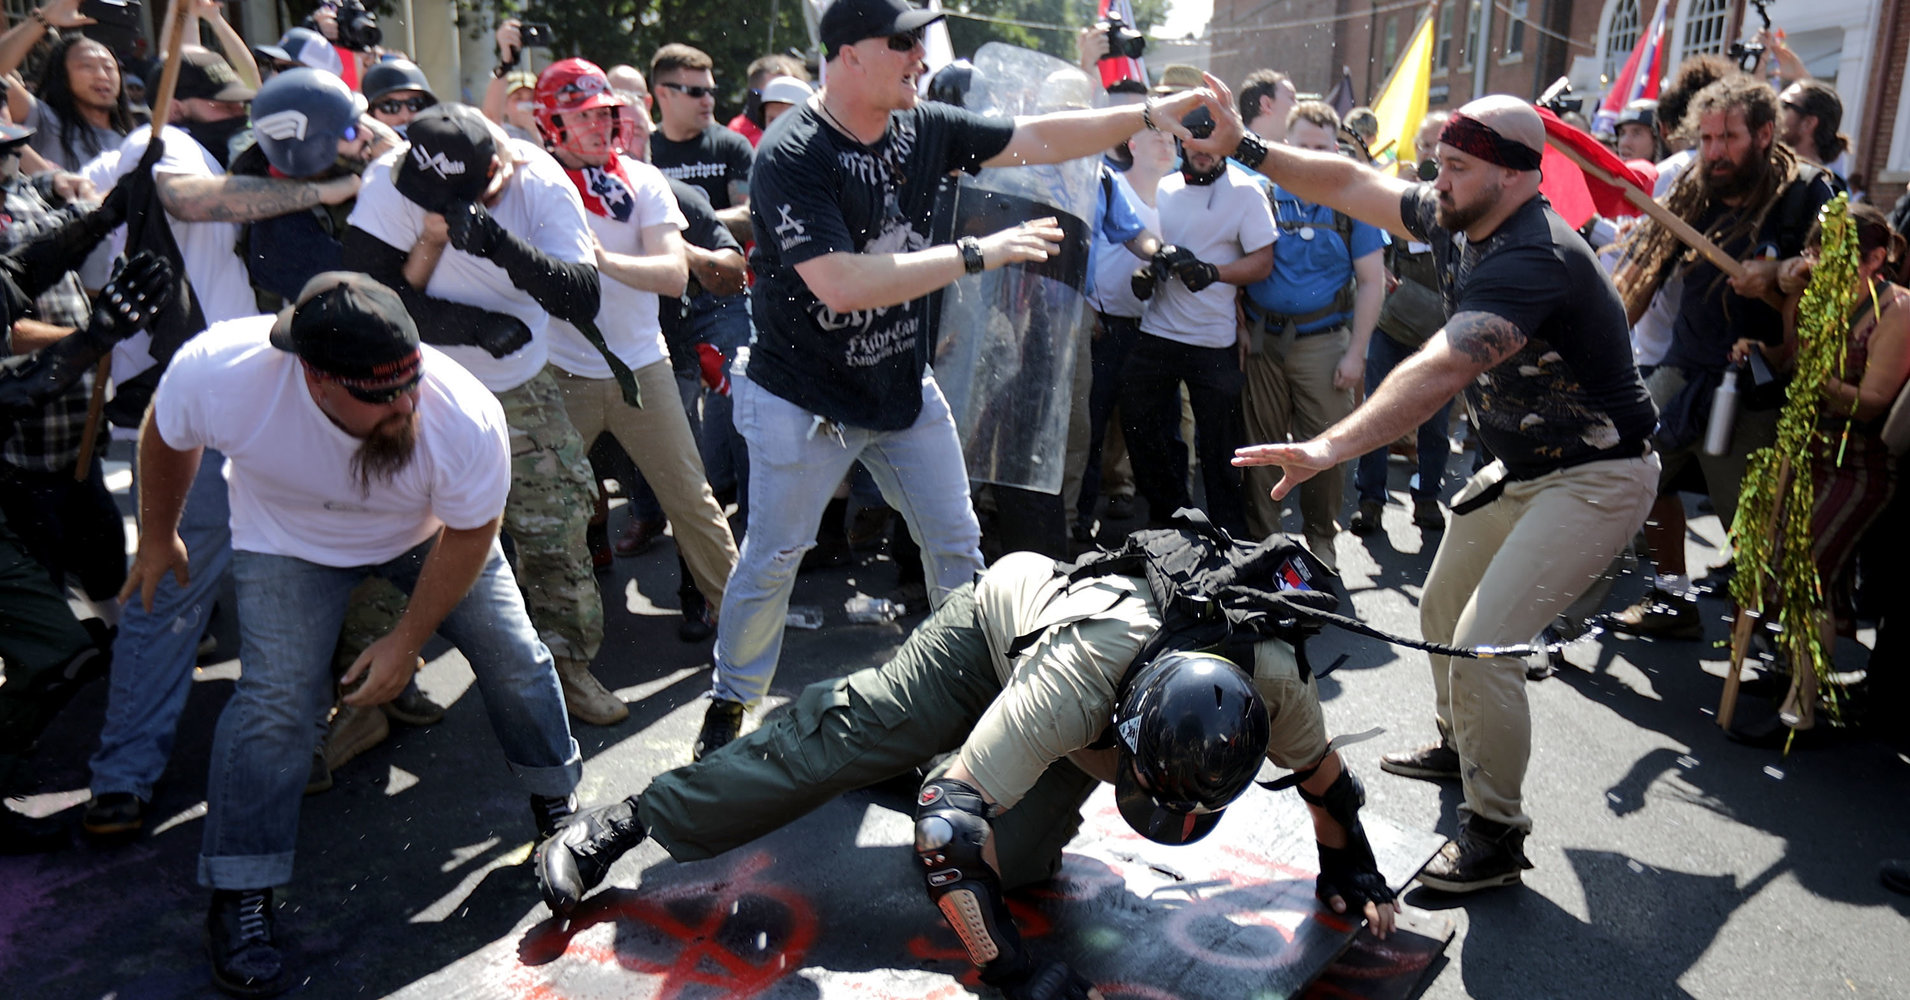 violence, change, race relations